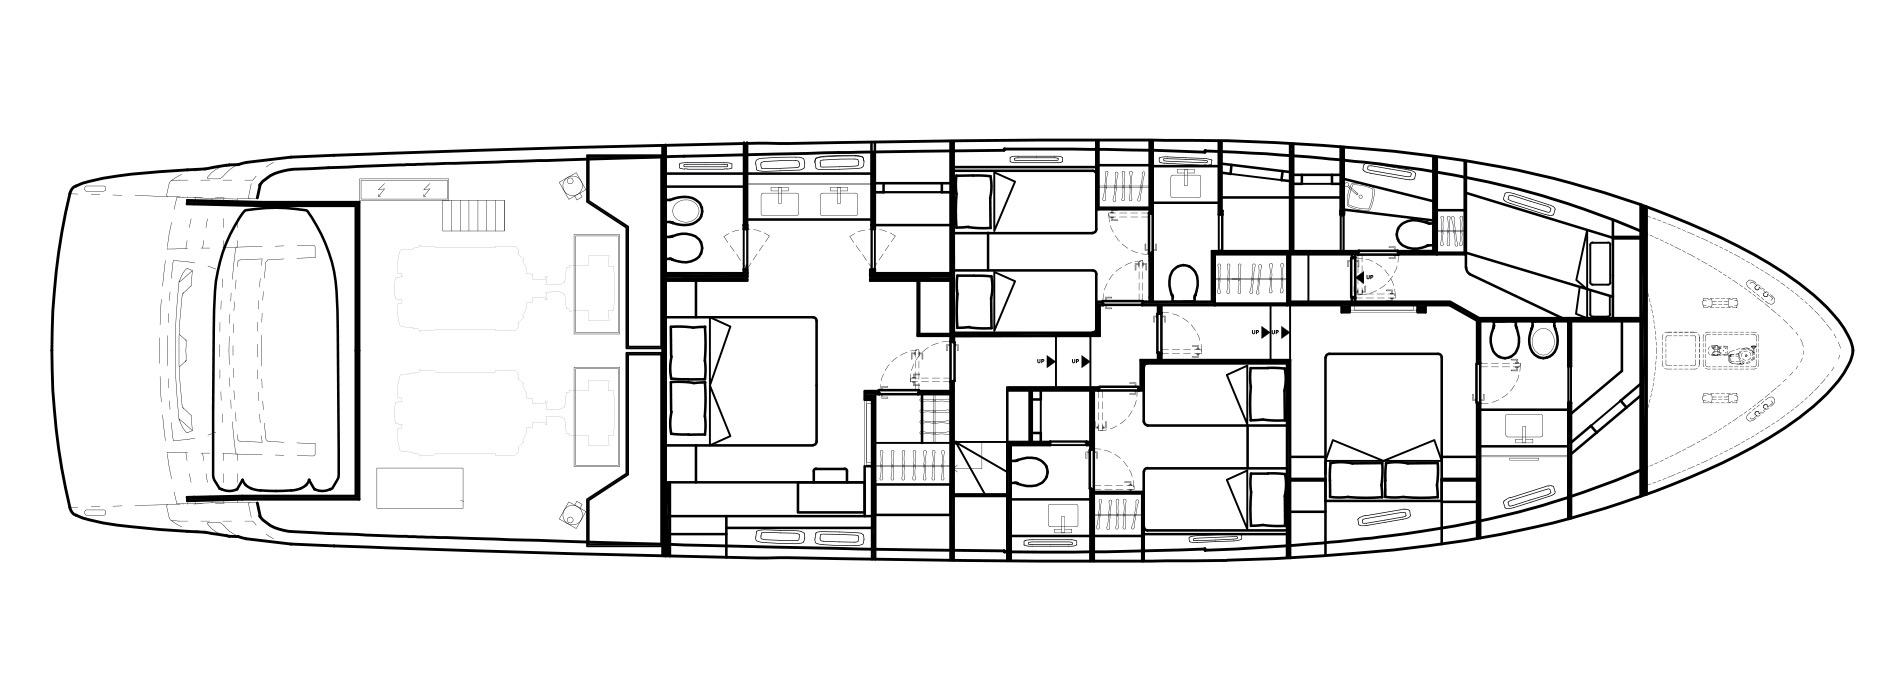 Sanlorenzo Yachts SL78 Lower Deck Version A